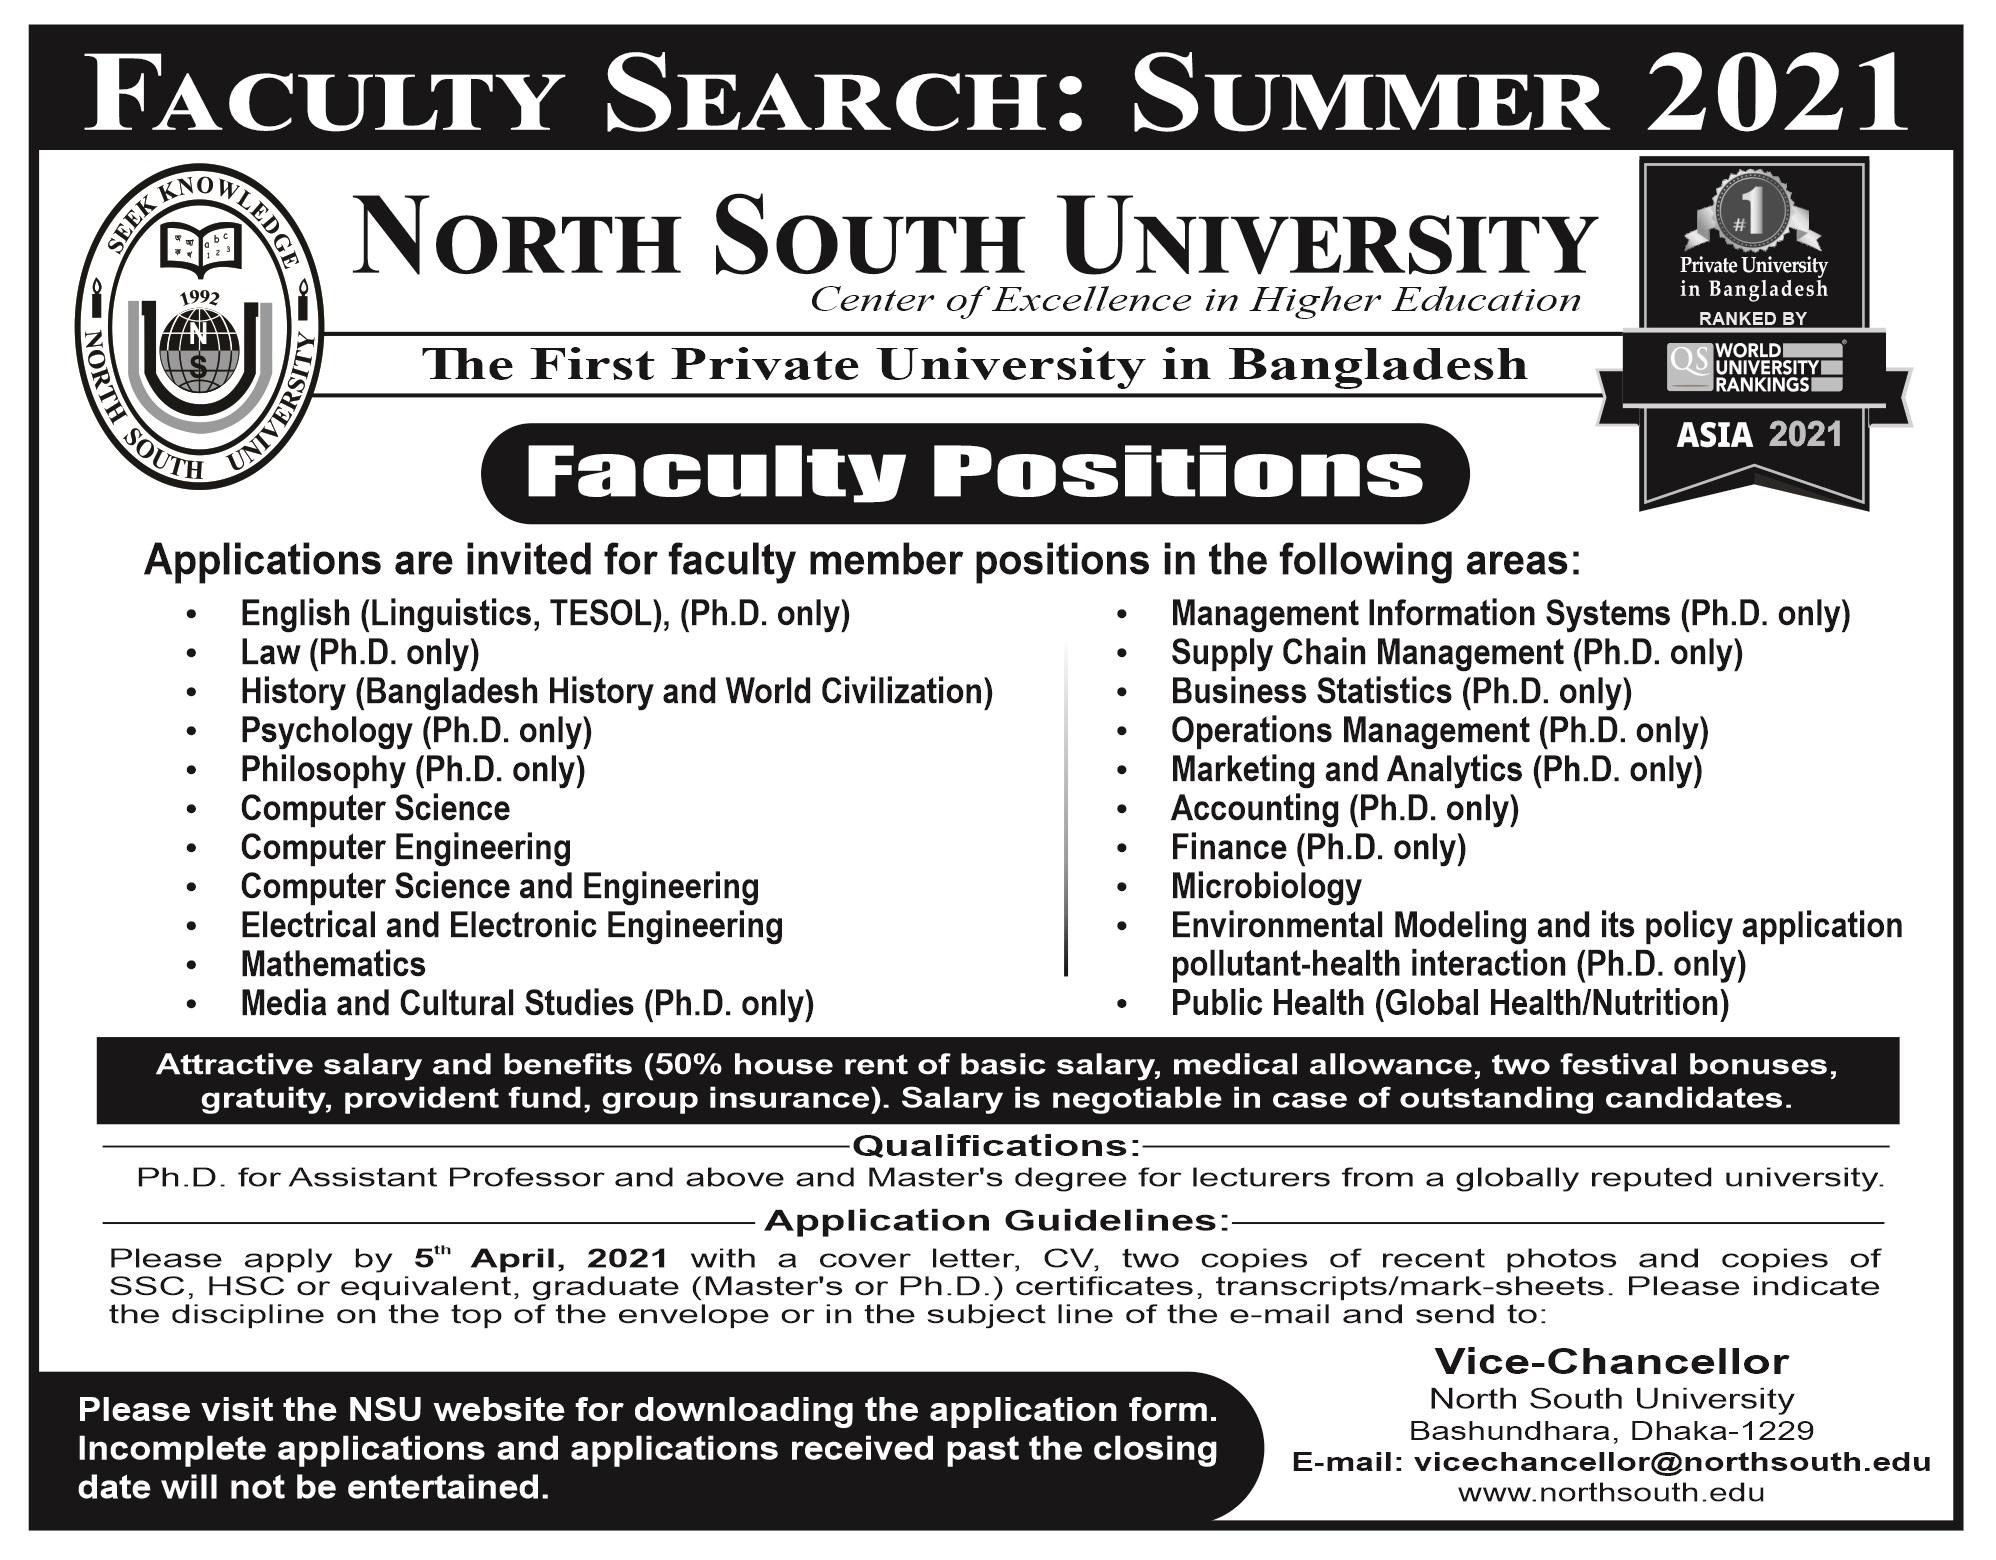 Private University Job Circular 2021 - Private University Job Circular 2021 - বেসরকারি বিশ্ববিদ্যালয় চাকরির খবর ২০২১ - শিক্ষা প্রতিষ্টানে চাকরির খবর ২০২১- শিক্ষা প্রতিষ্টানে চাকরির খবর ২০২১